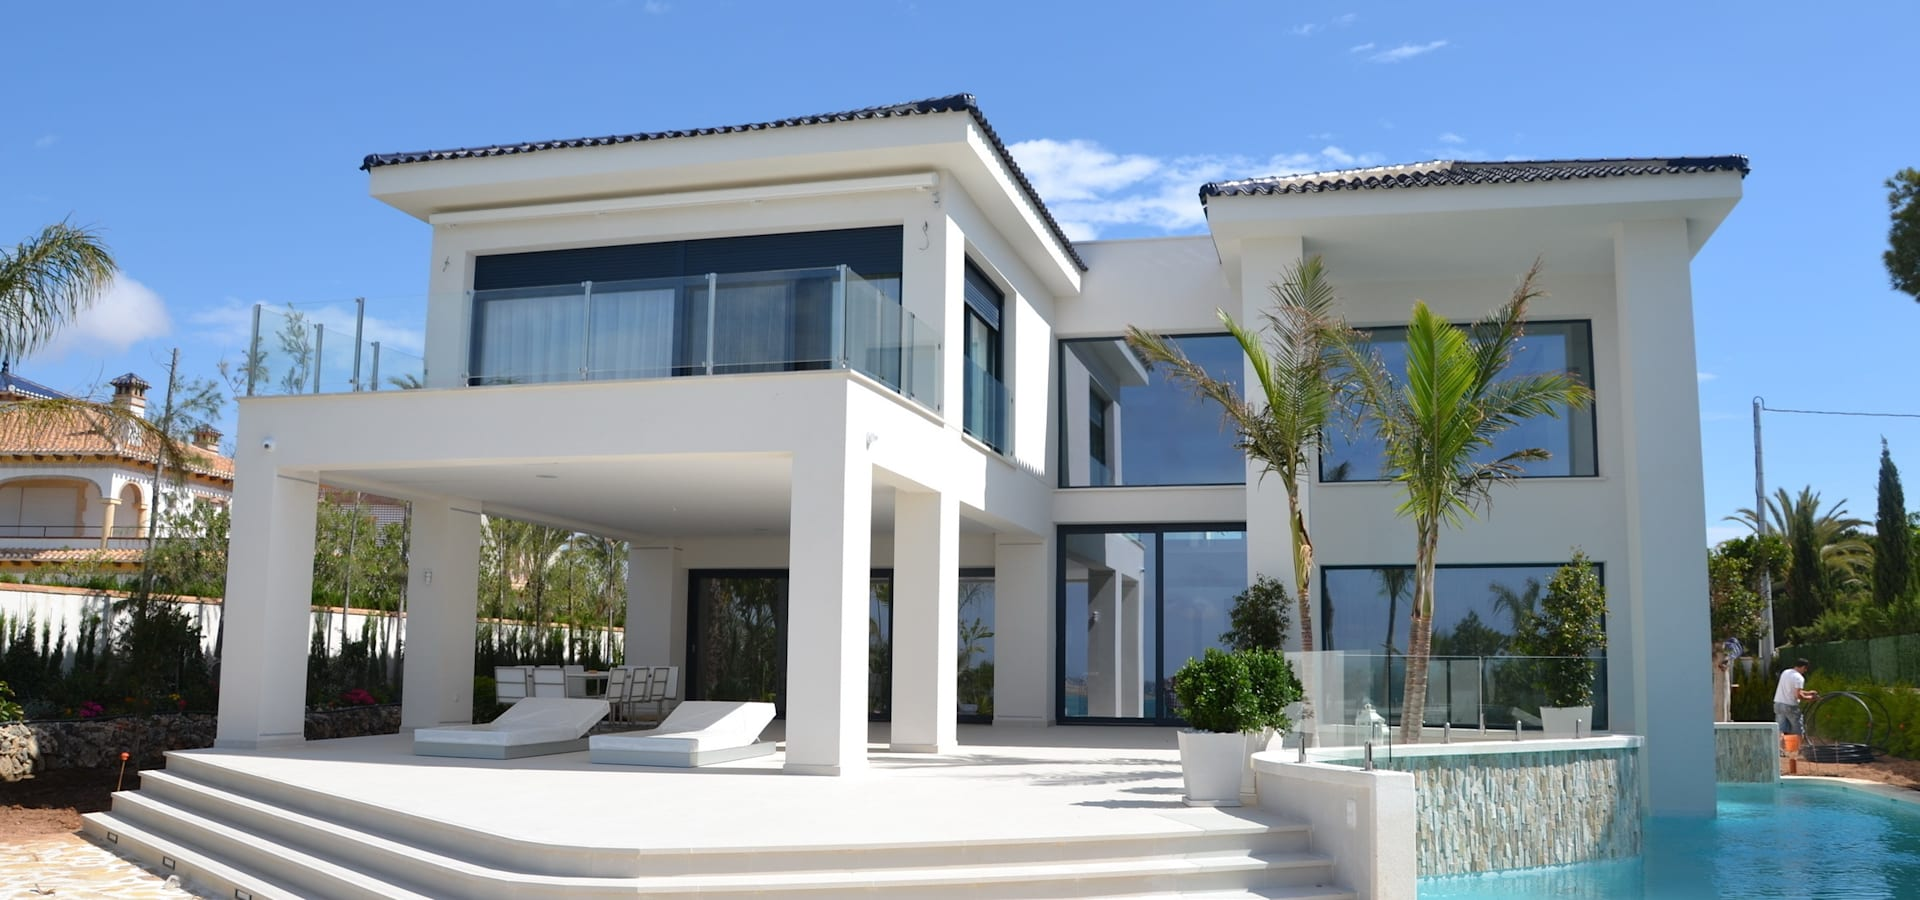 Alicante arquitectura y urbanismo slp casa ausina homify - Alicante urbanismo ...